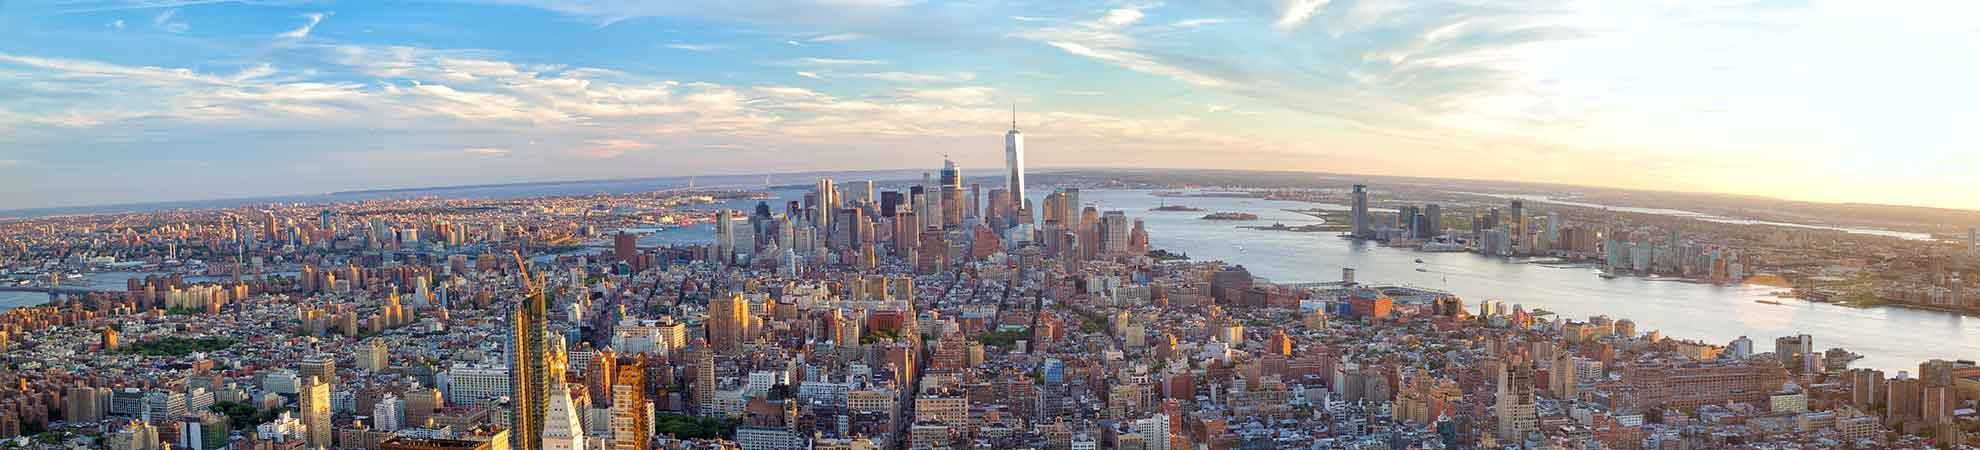 Préparer un voyage New York